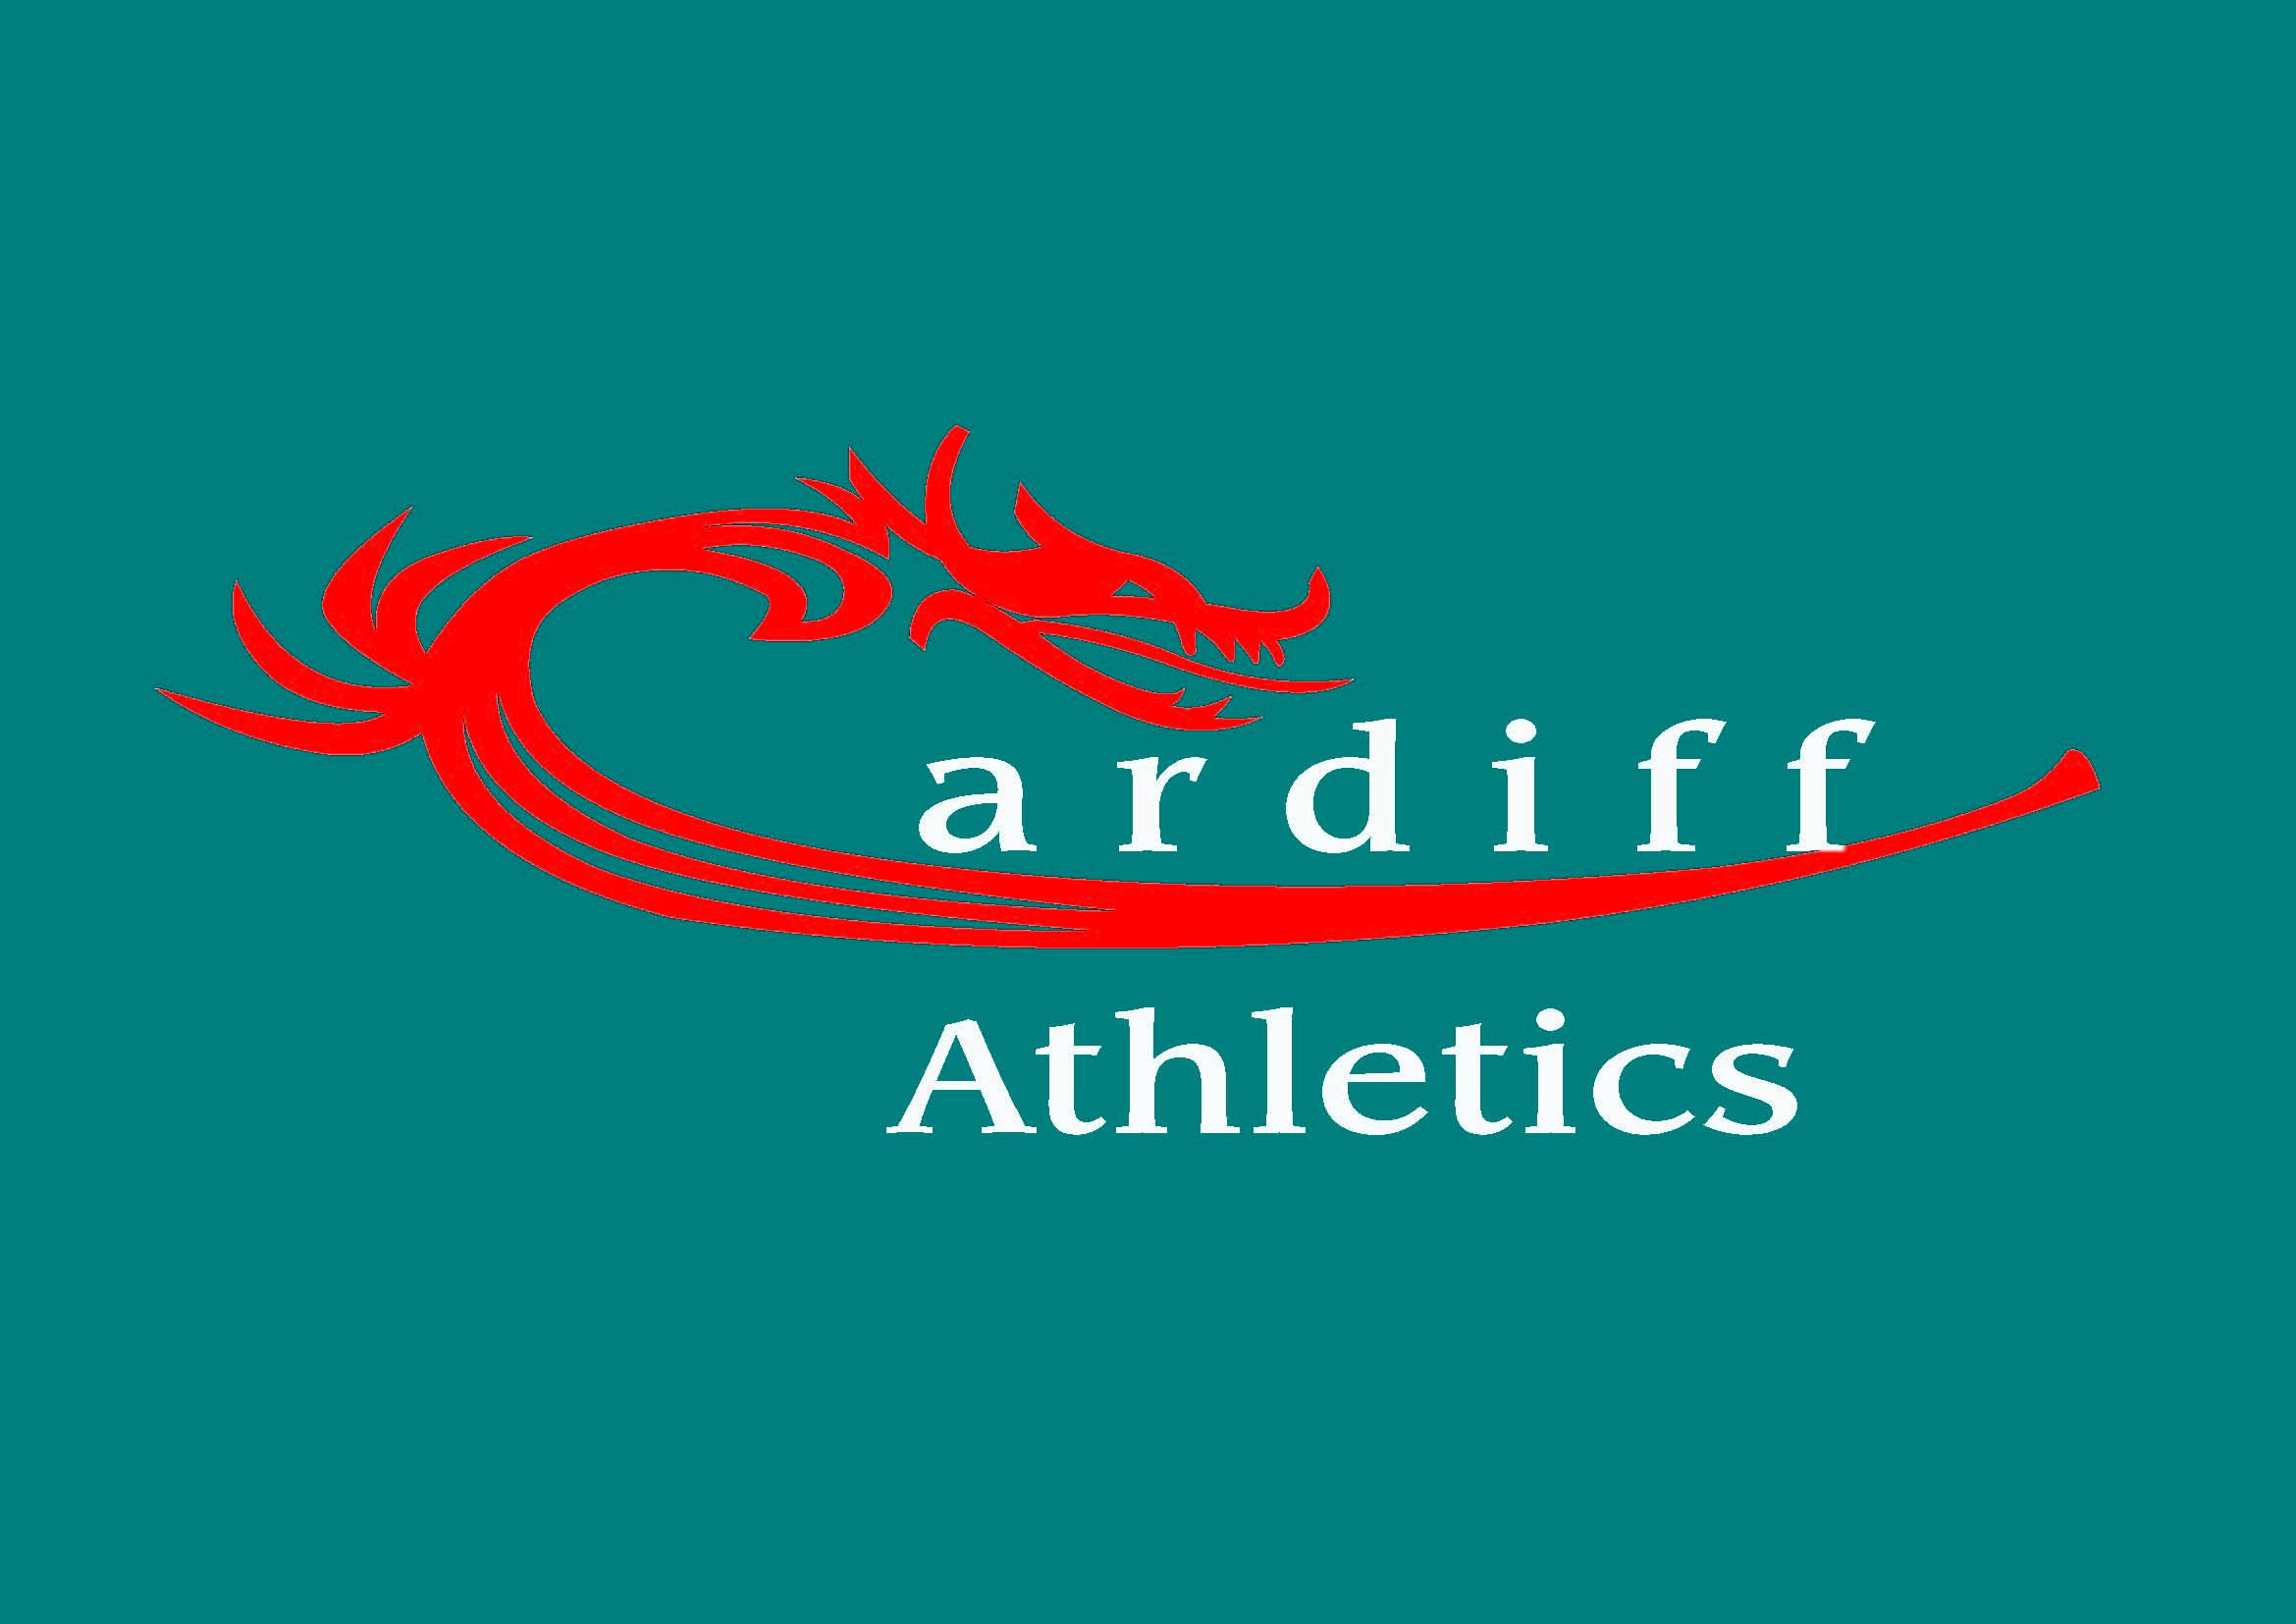 Cardiff Amateur Athletics Club